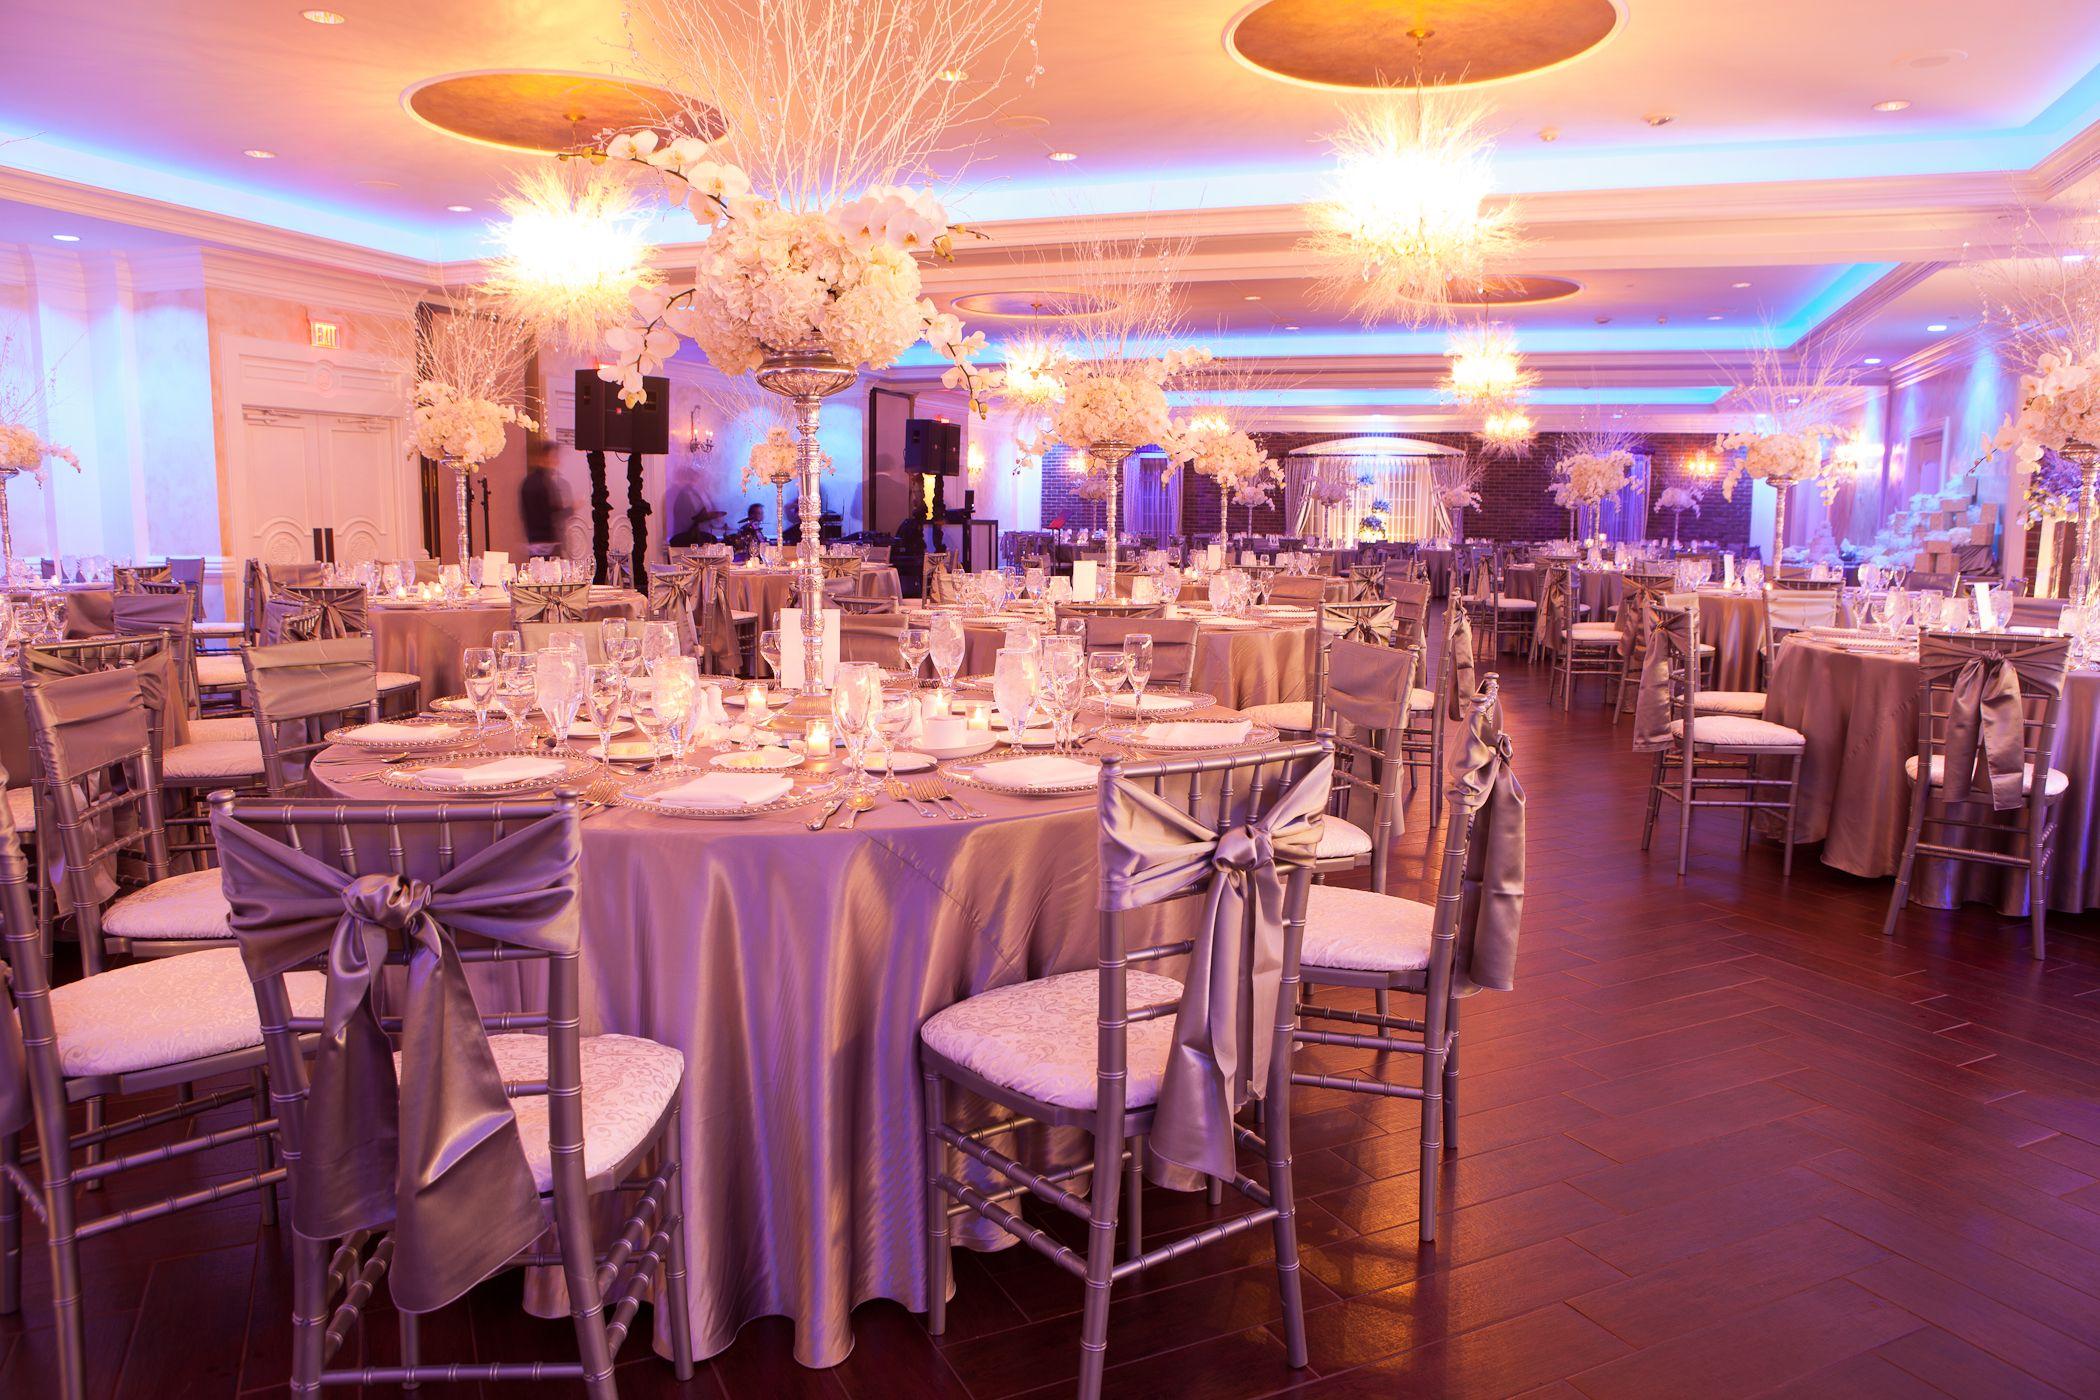 silver winter wonderland wedding blue uplighting event center at backgrounds diy for computer high resolution